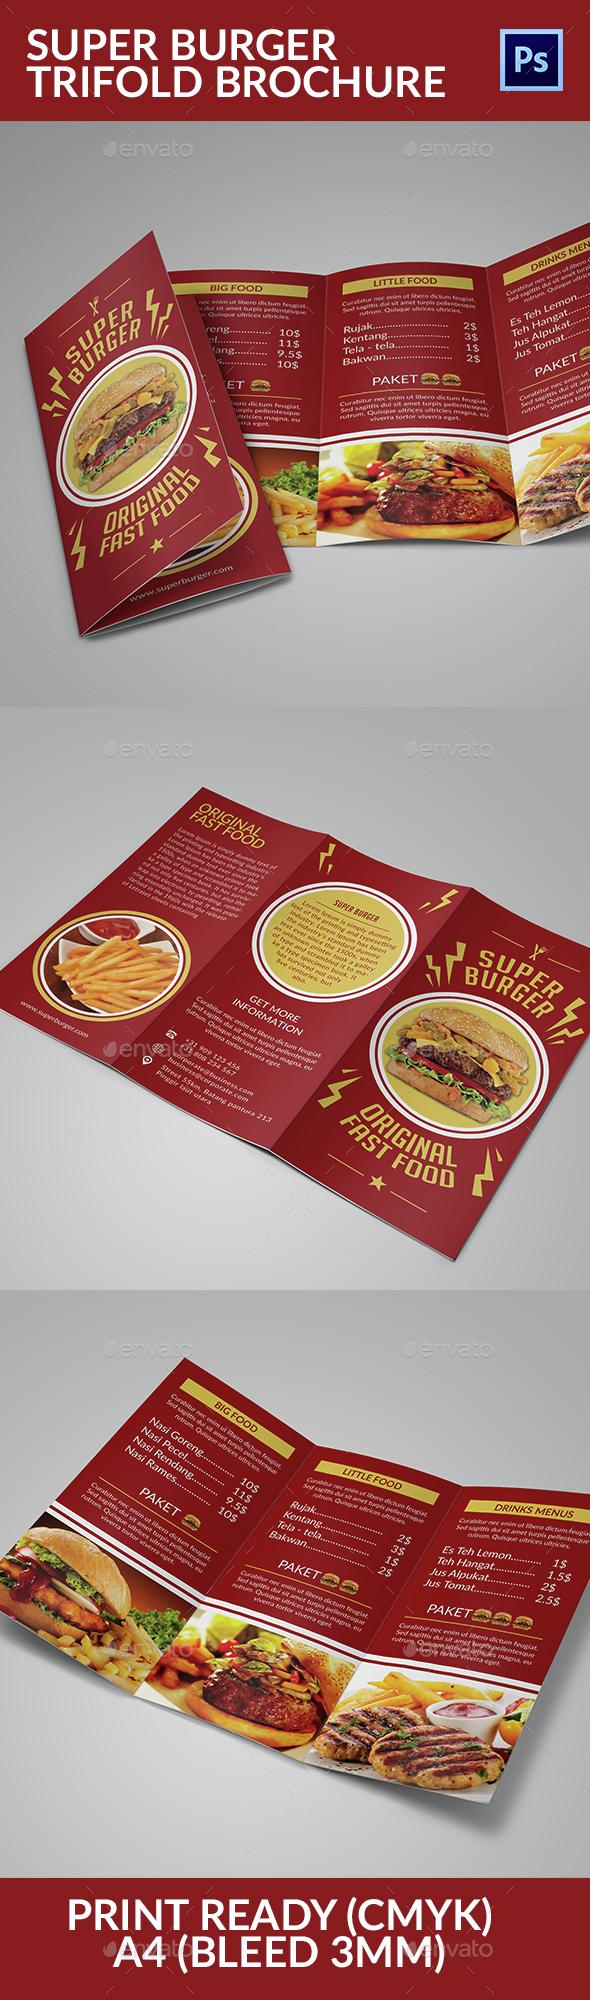 Super Burger Trifold Brochure - Food Menus Print Templates